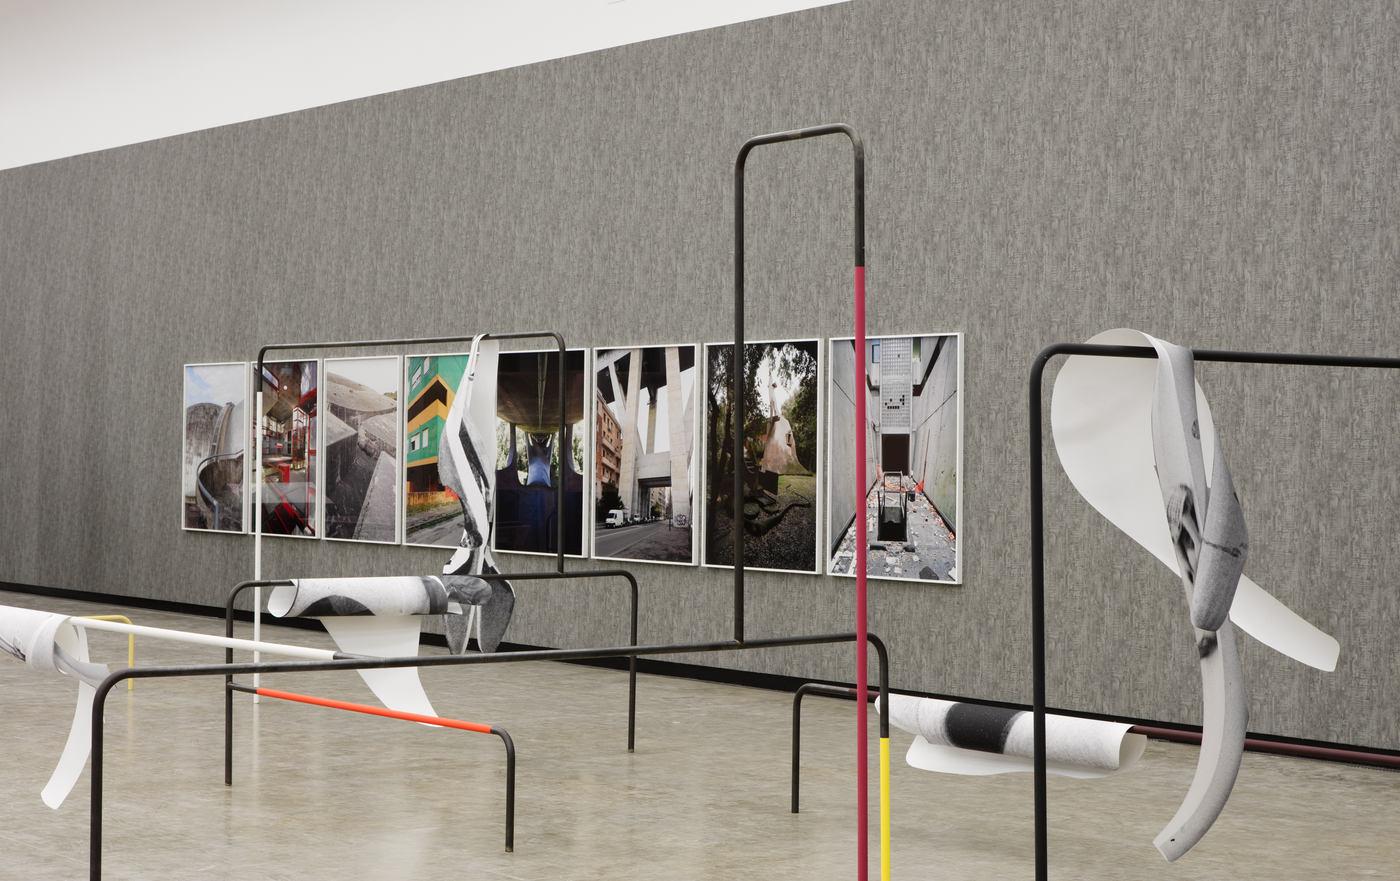 Béton at Kunsthalle Wien